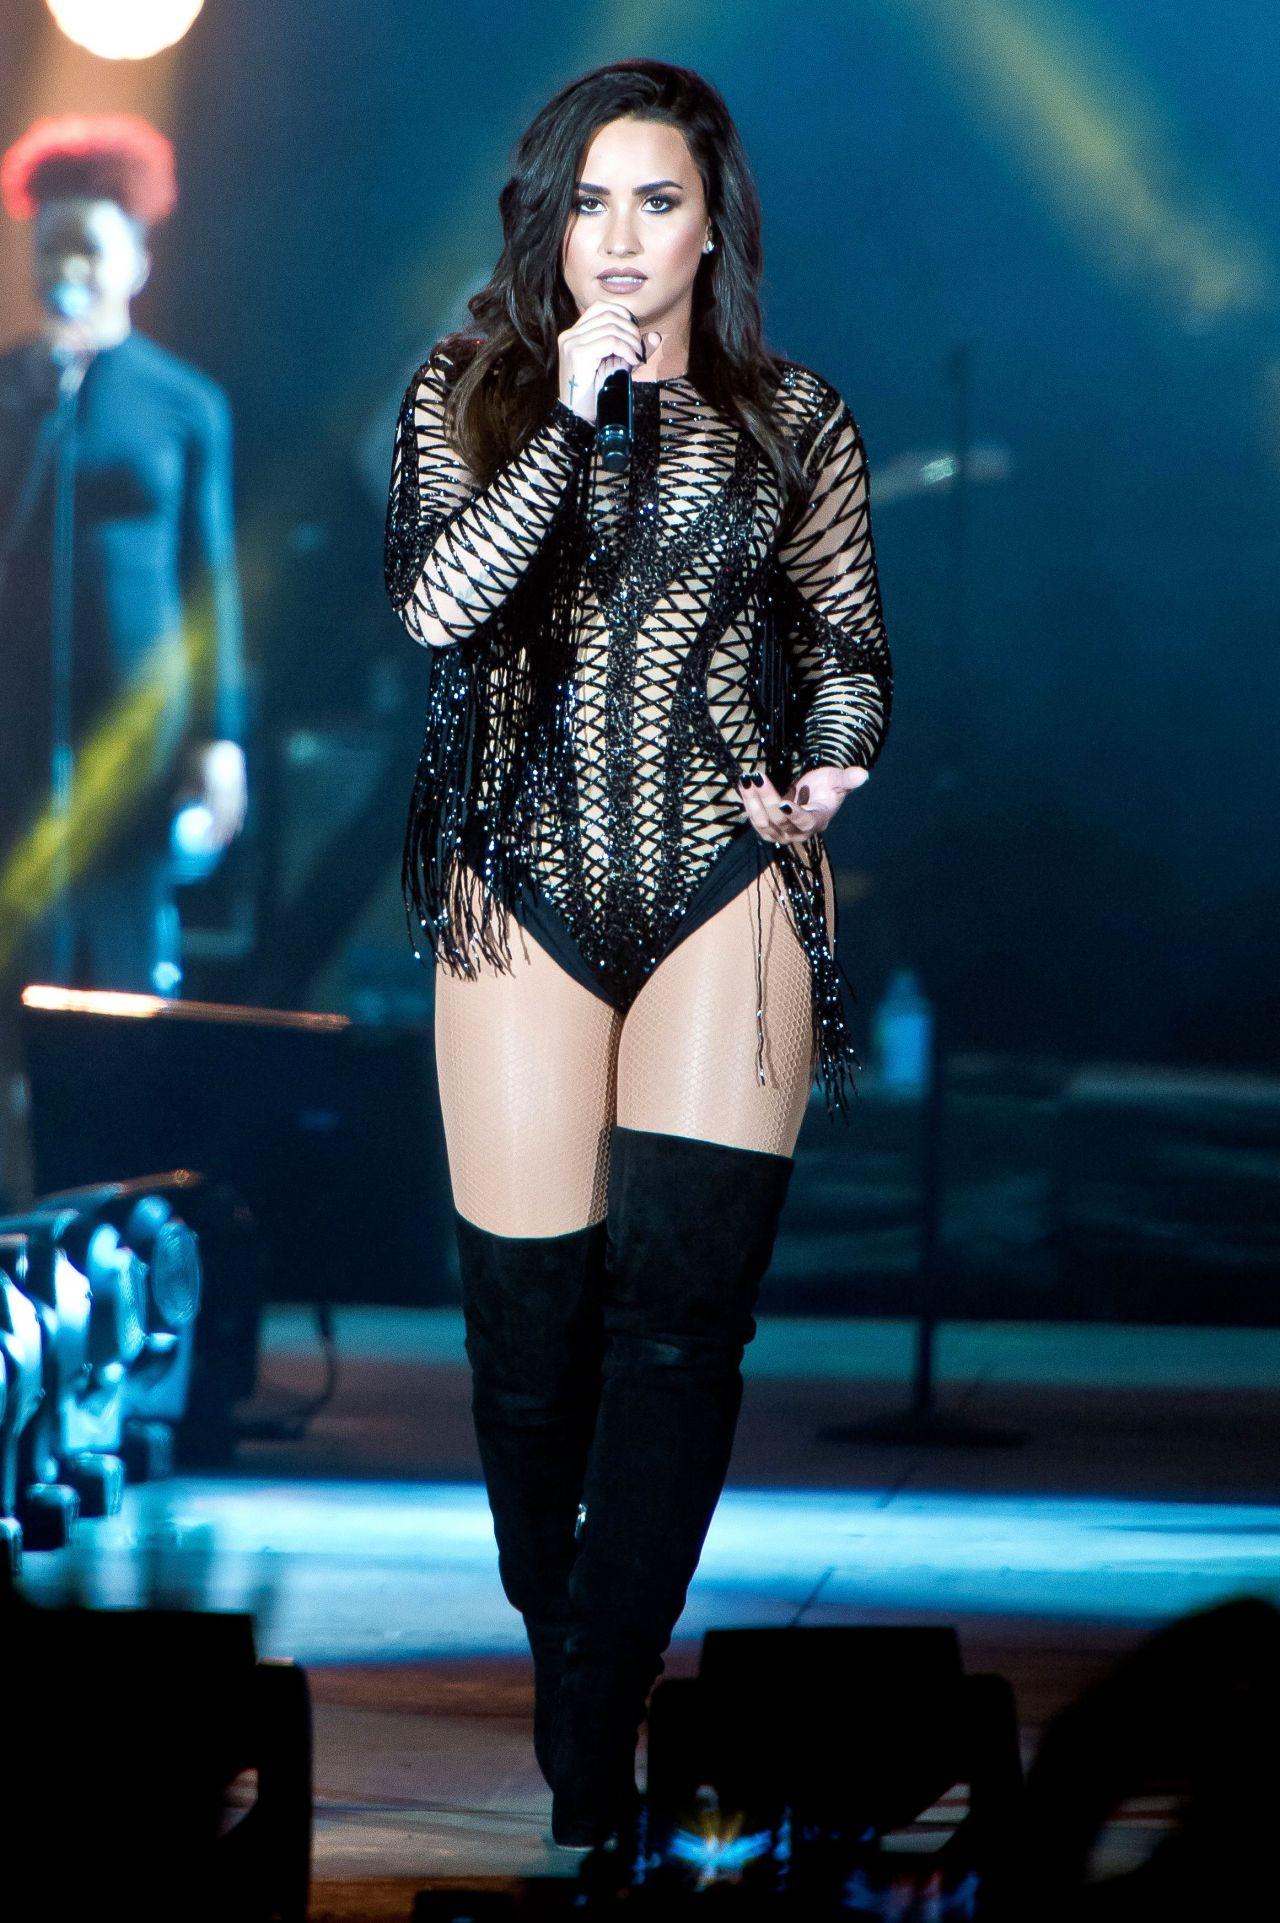 Ariana grande dangerous woman visual 1 - 3 part 3